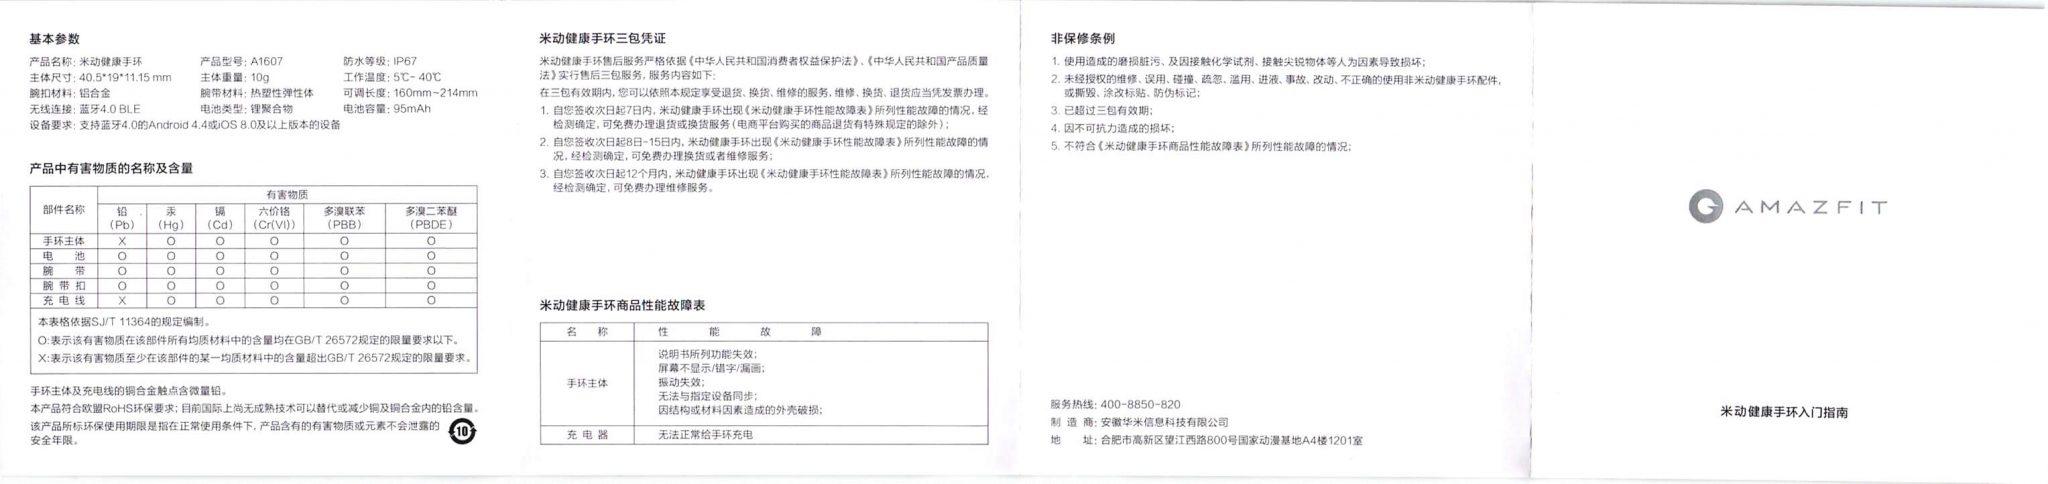 Xiaomi AMAZFIT ハートレート スマートバンド 取説1